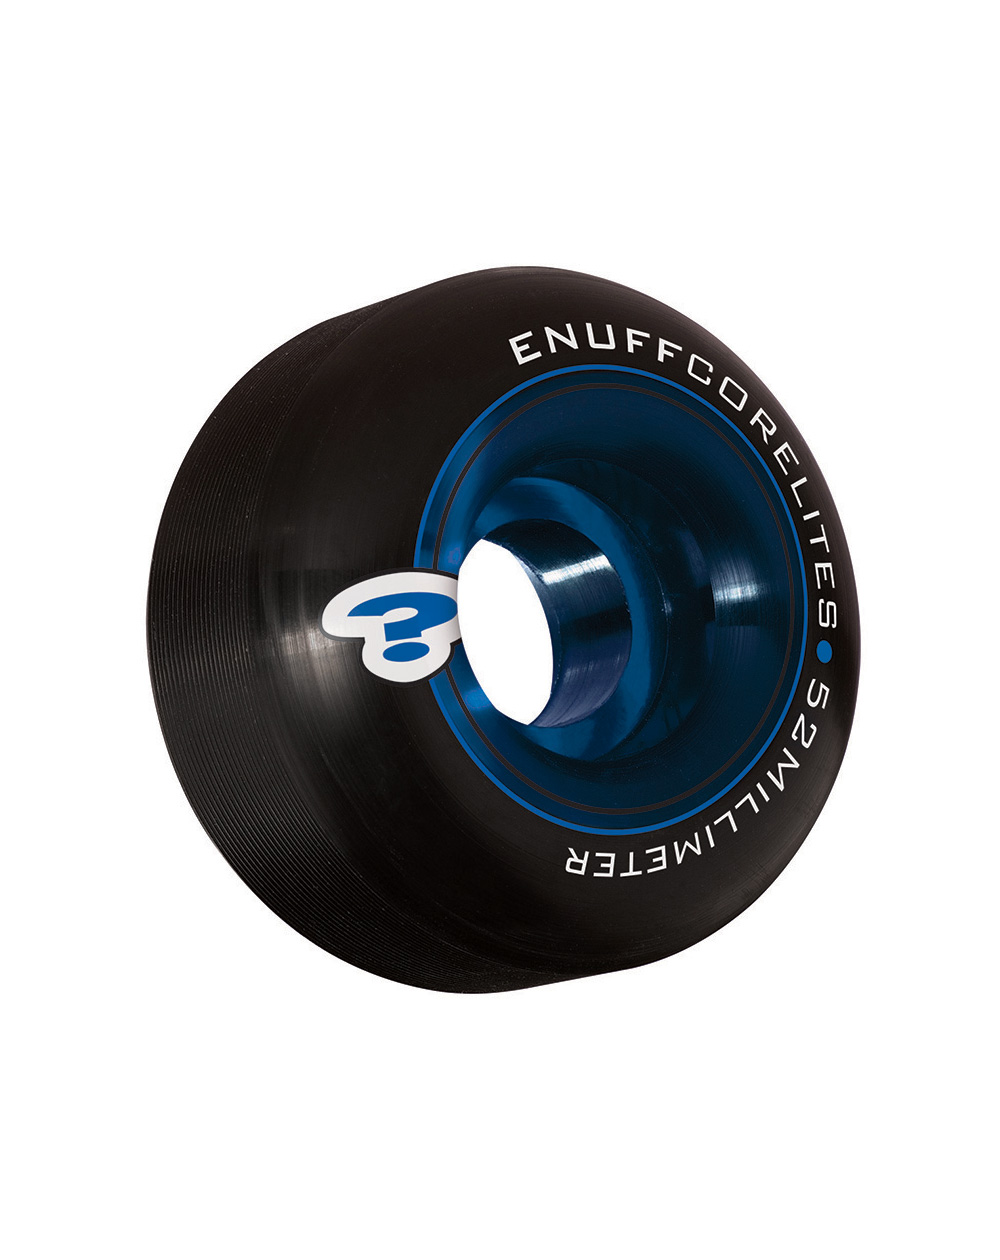 Enuff Ruote Skateboard Corelites 52mm Black/Blue 4 pz